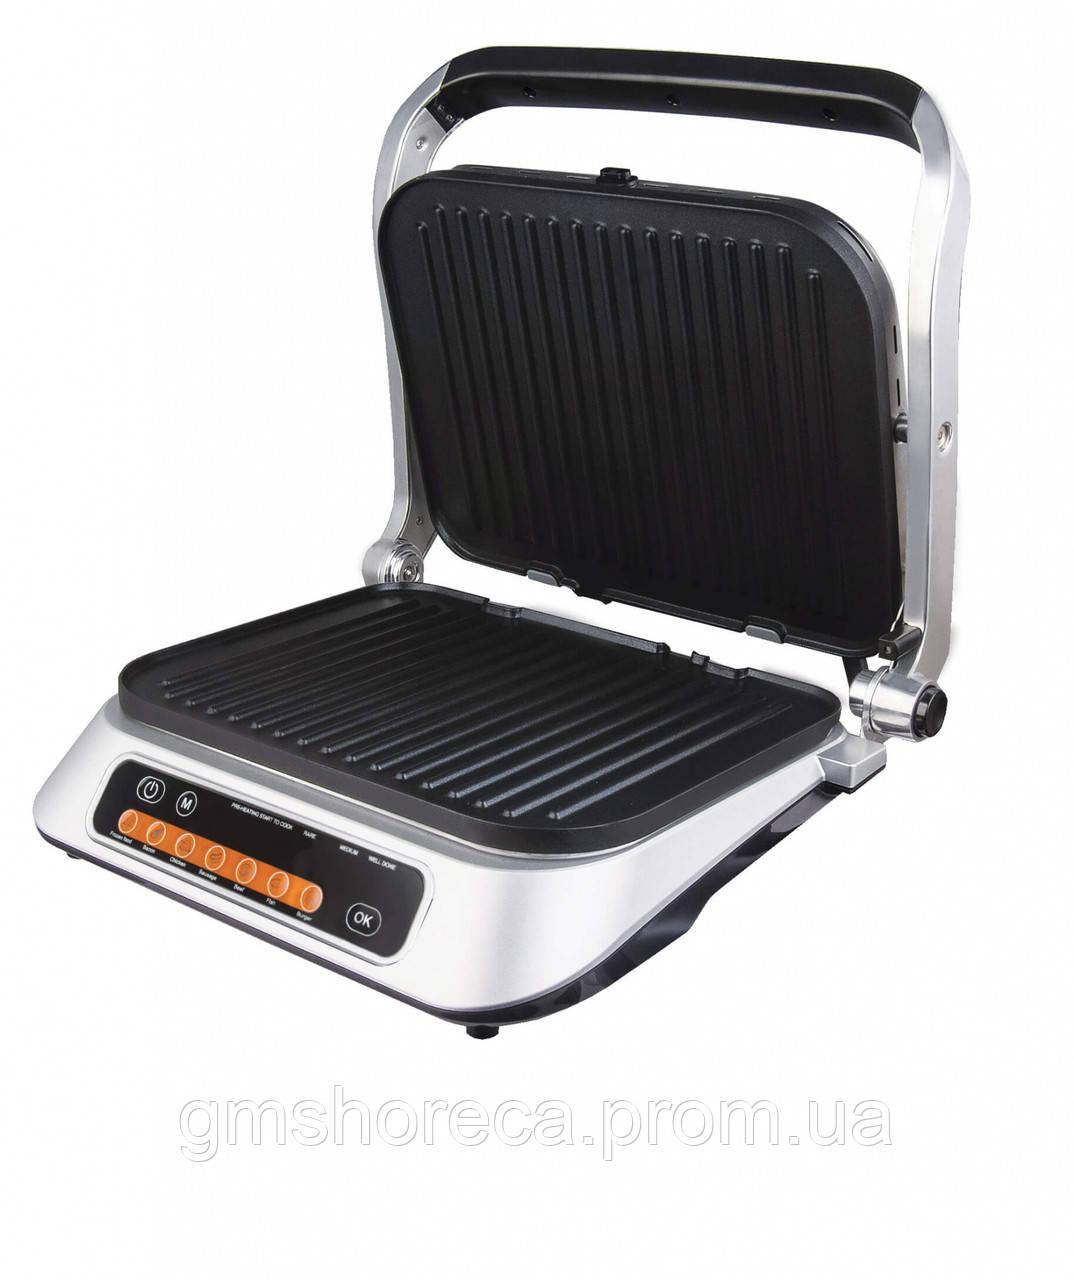 Пресс-гриль GEMLUX GL-CG871N